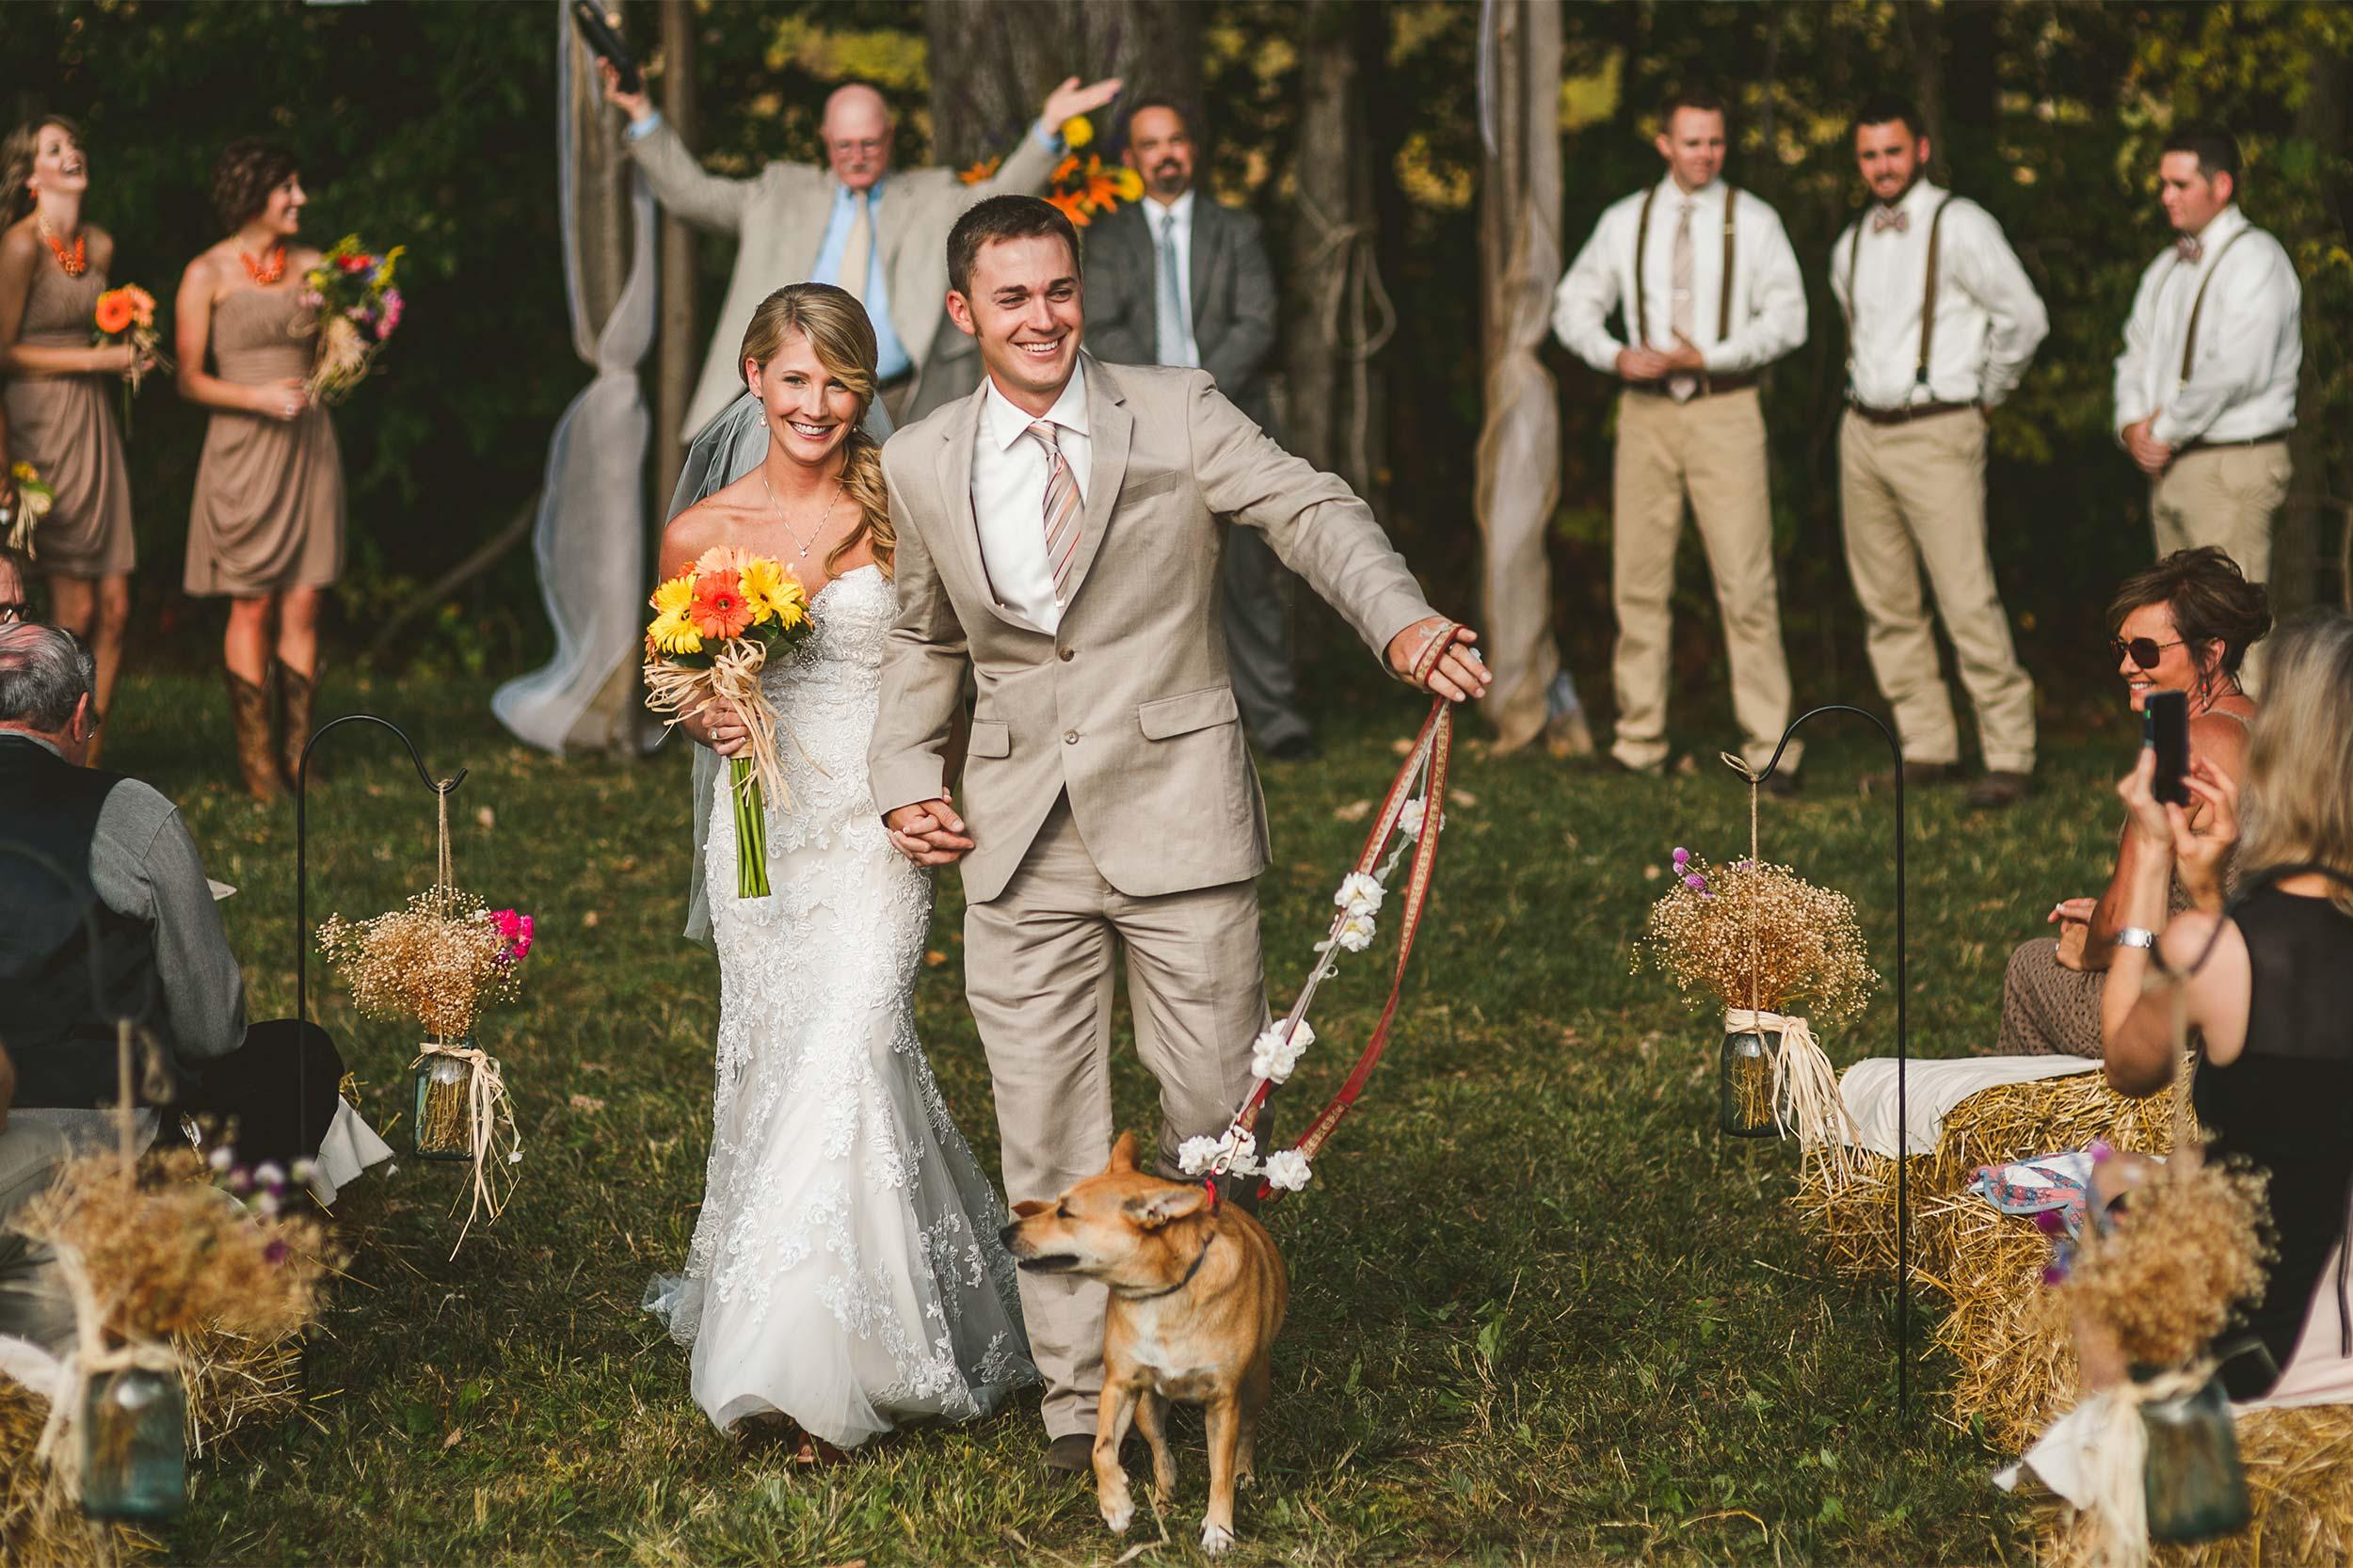 wedding-recessional-bride-groom-with-dog.jpg